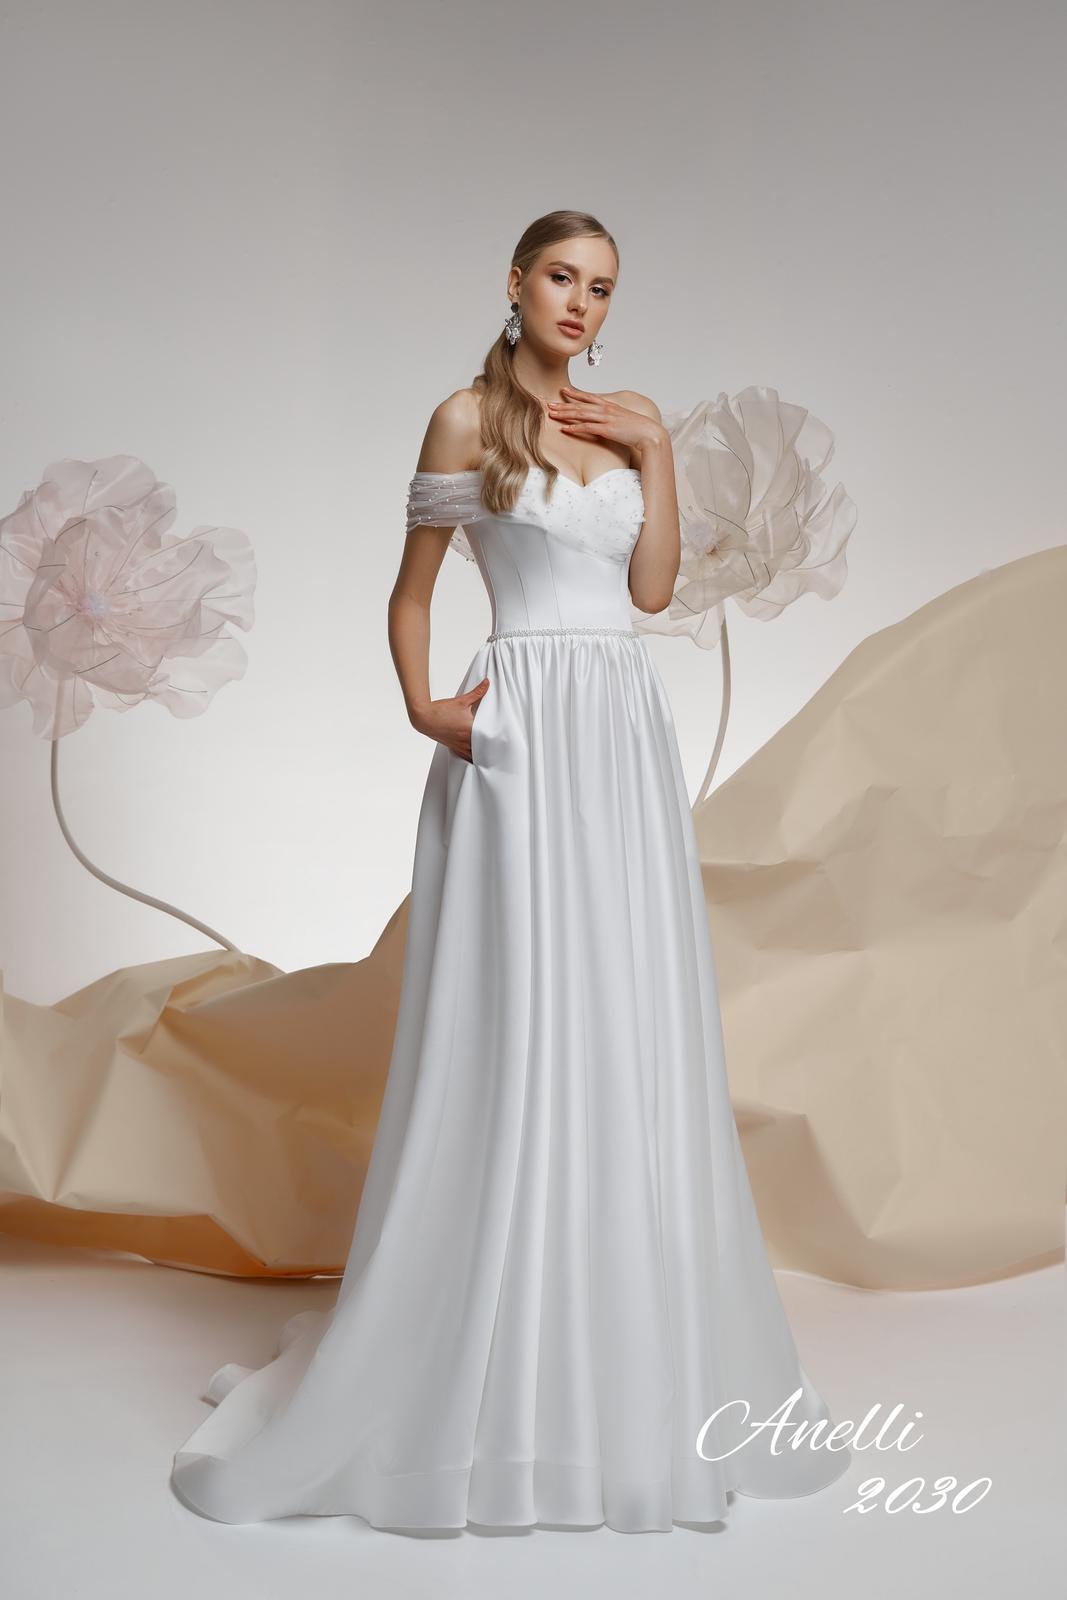 Svadobné šaty - Imagine 2030 - Obrázok č. 1